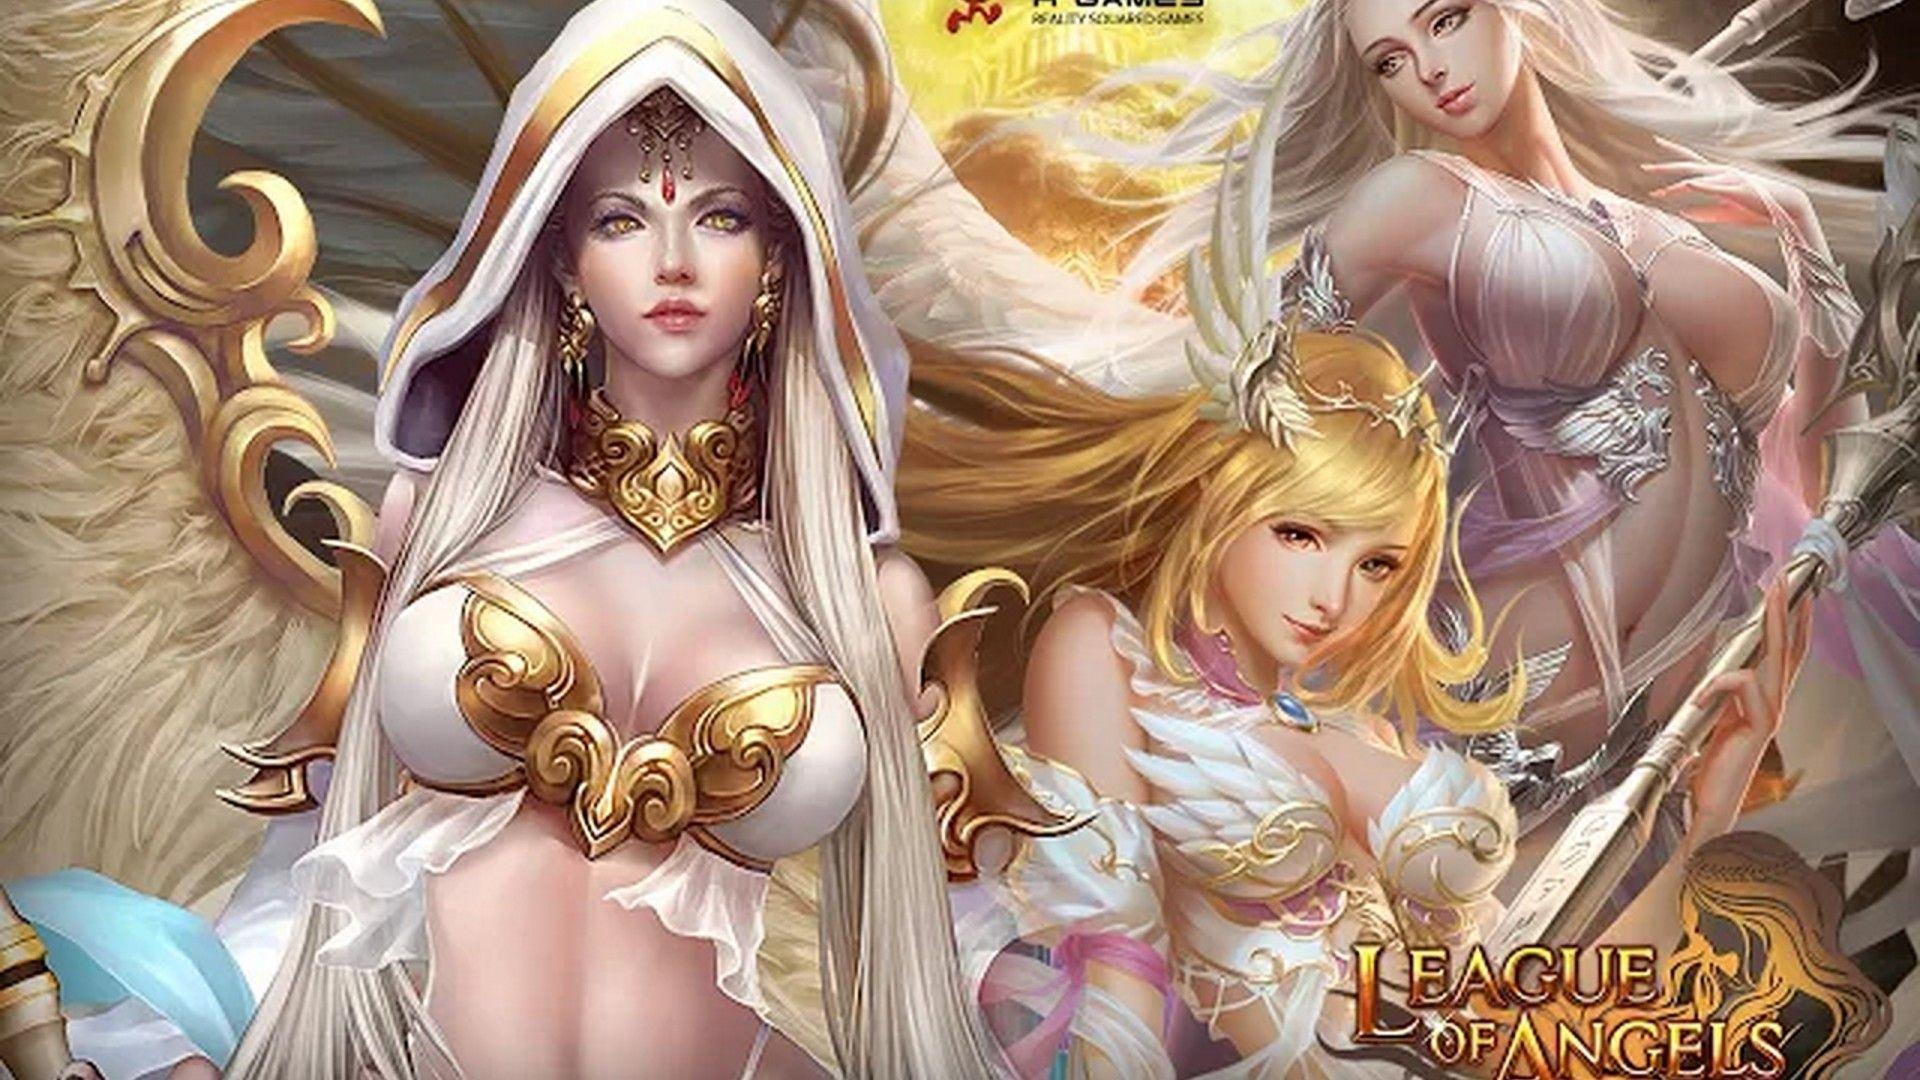 League Angels Fantasy Games Hd Wallpaper Wallpapers